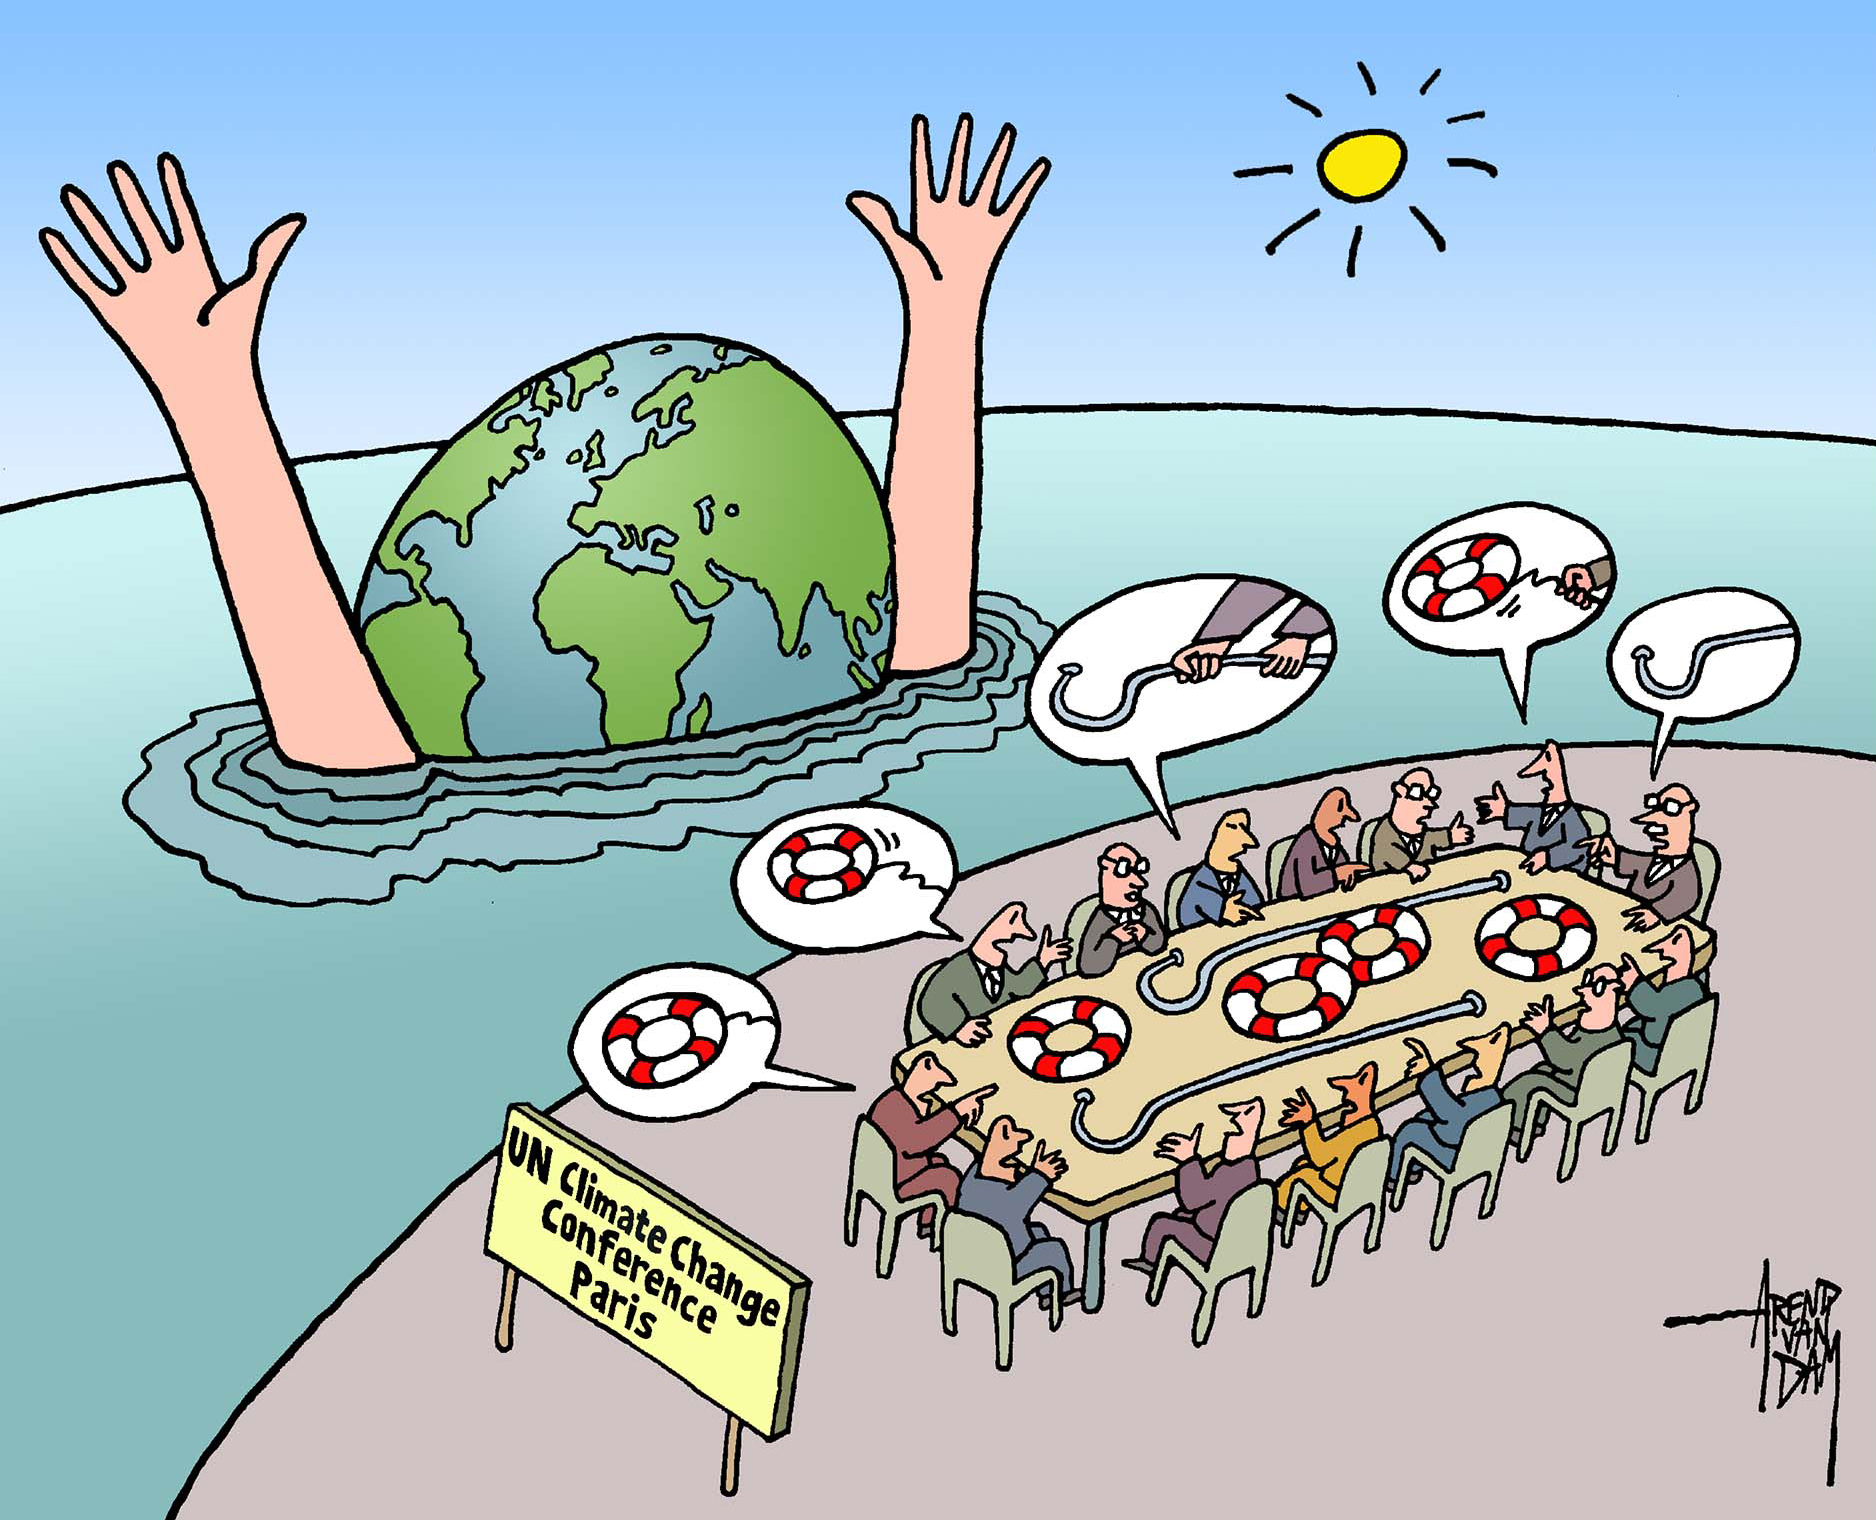 U.N. Climate Conferences: The Cartoonist's Skeptical Eye